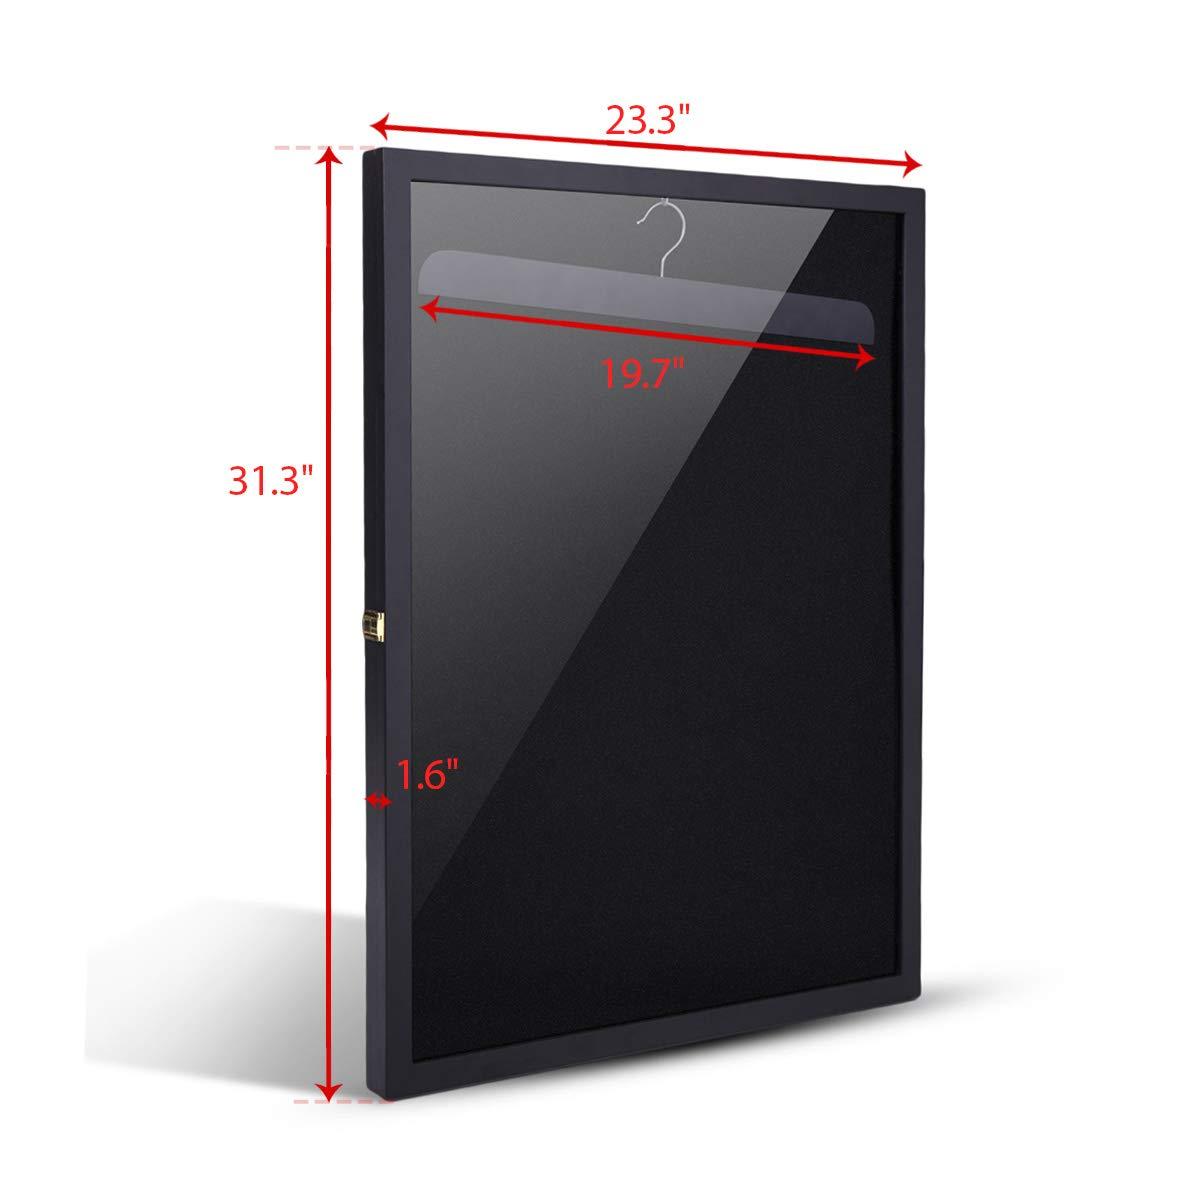 betterhomechoice Black Sports Jersey Frame Box Wall Display/Case Rack Frame Locable (Black) by betterhomechoice (Image #3)